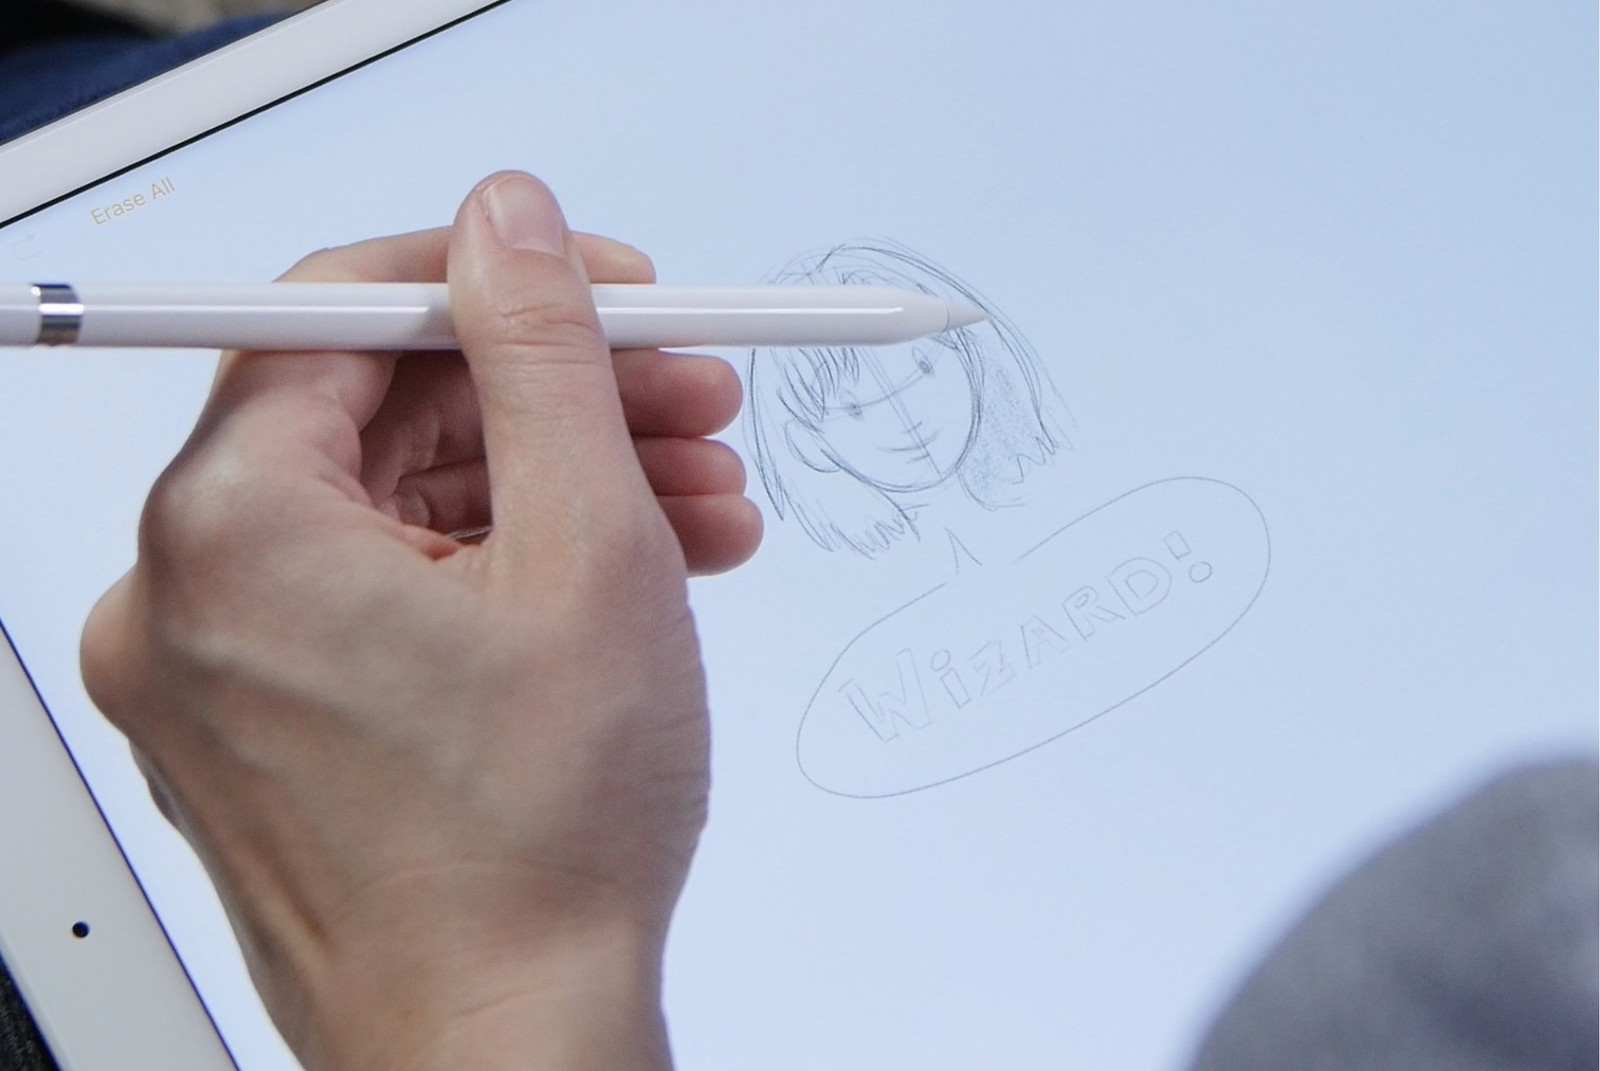 ipad-pro-shading-pencil-test-2.jpeg